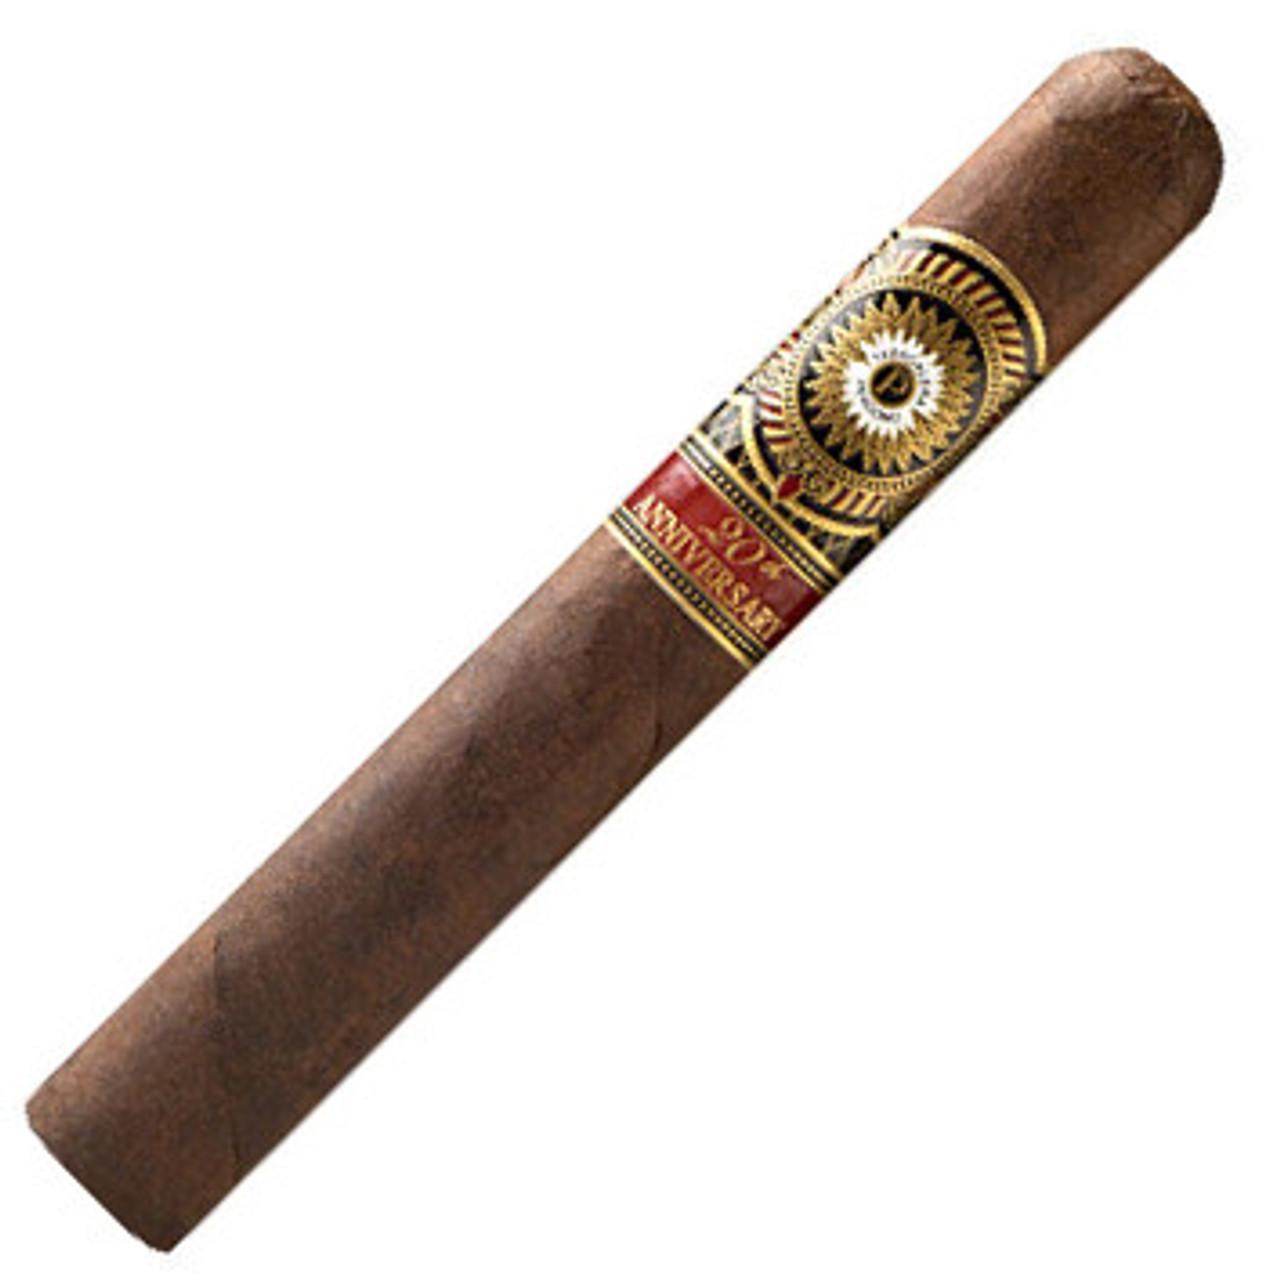 Perdomo 20th Anniversary Maduro Epicure Cigars - 6 x 56 (Box of 24)